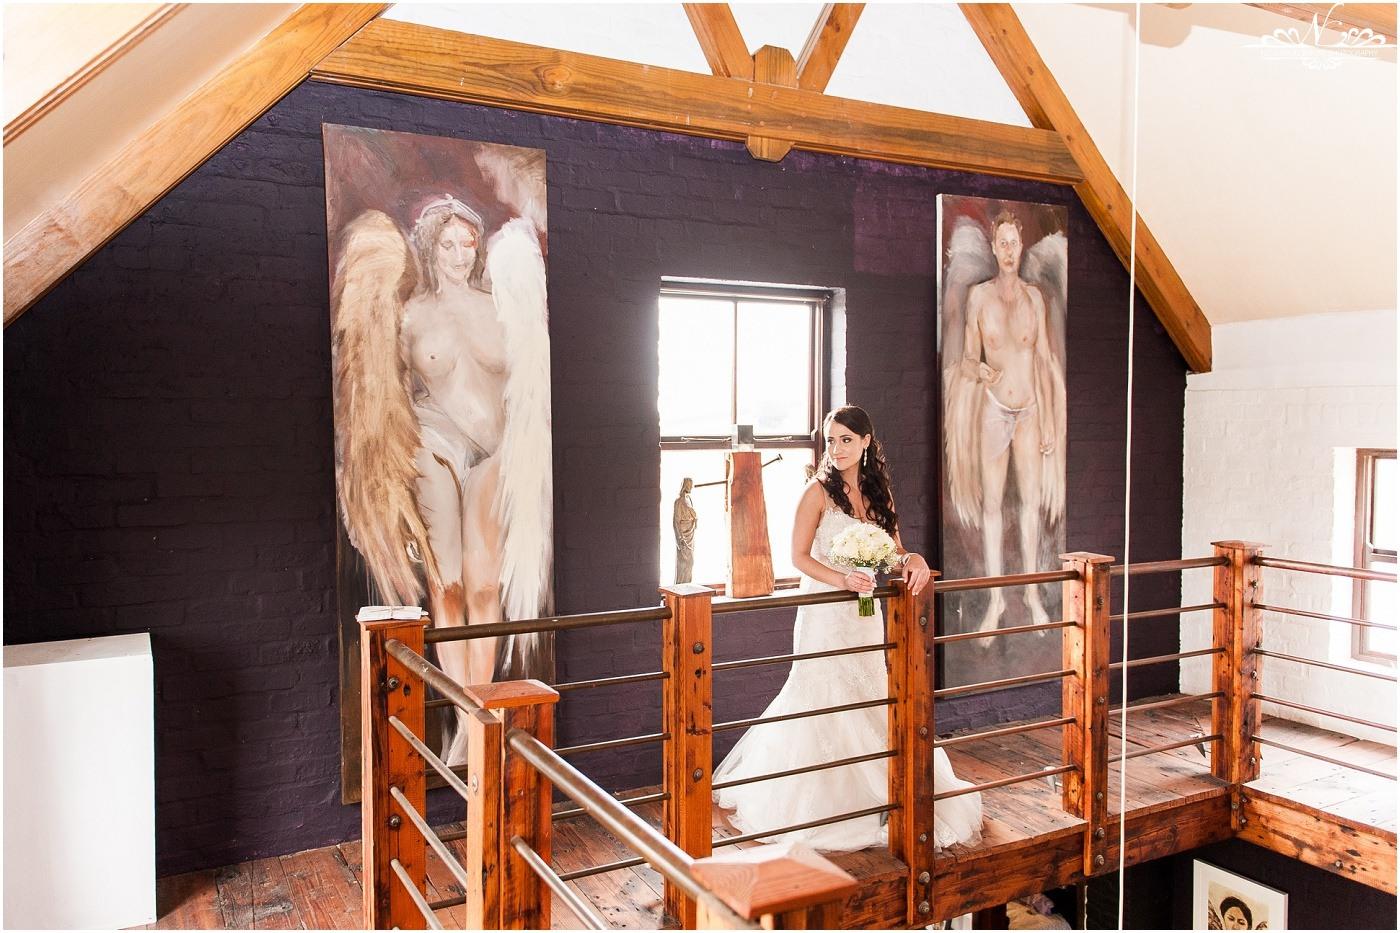 Eensgezind-Wedding-Photos-Nelis-Engelbrecht-Photography-042